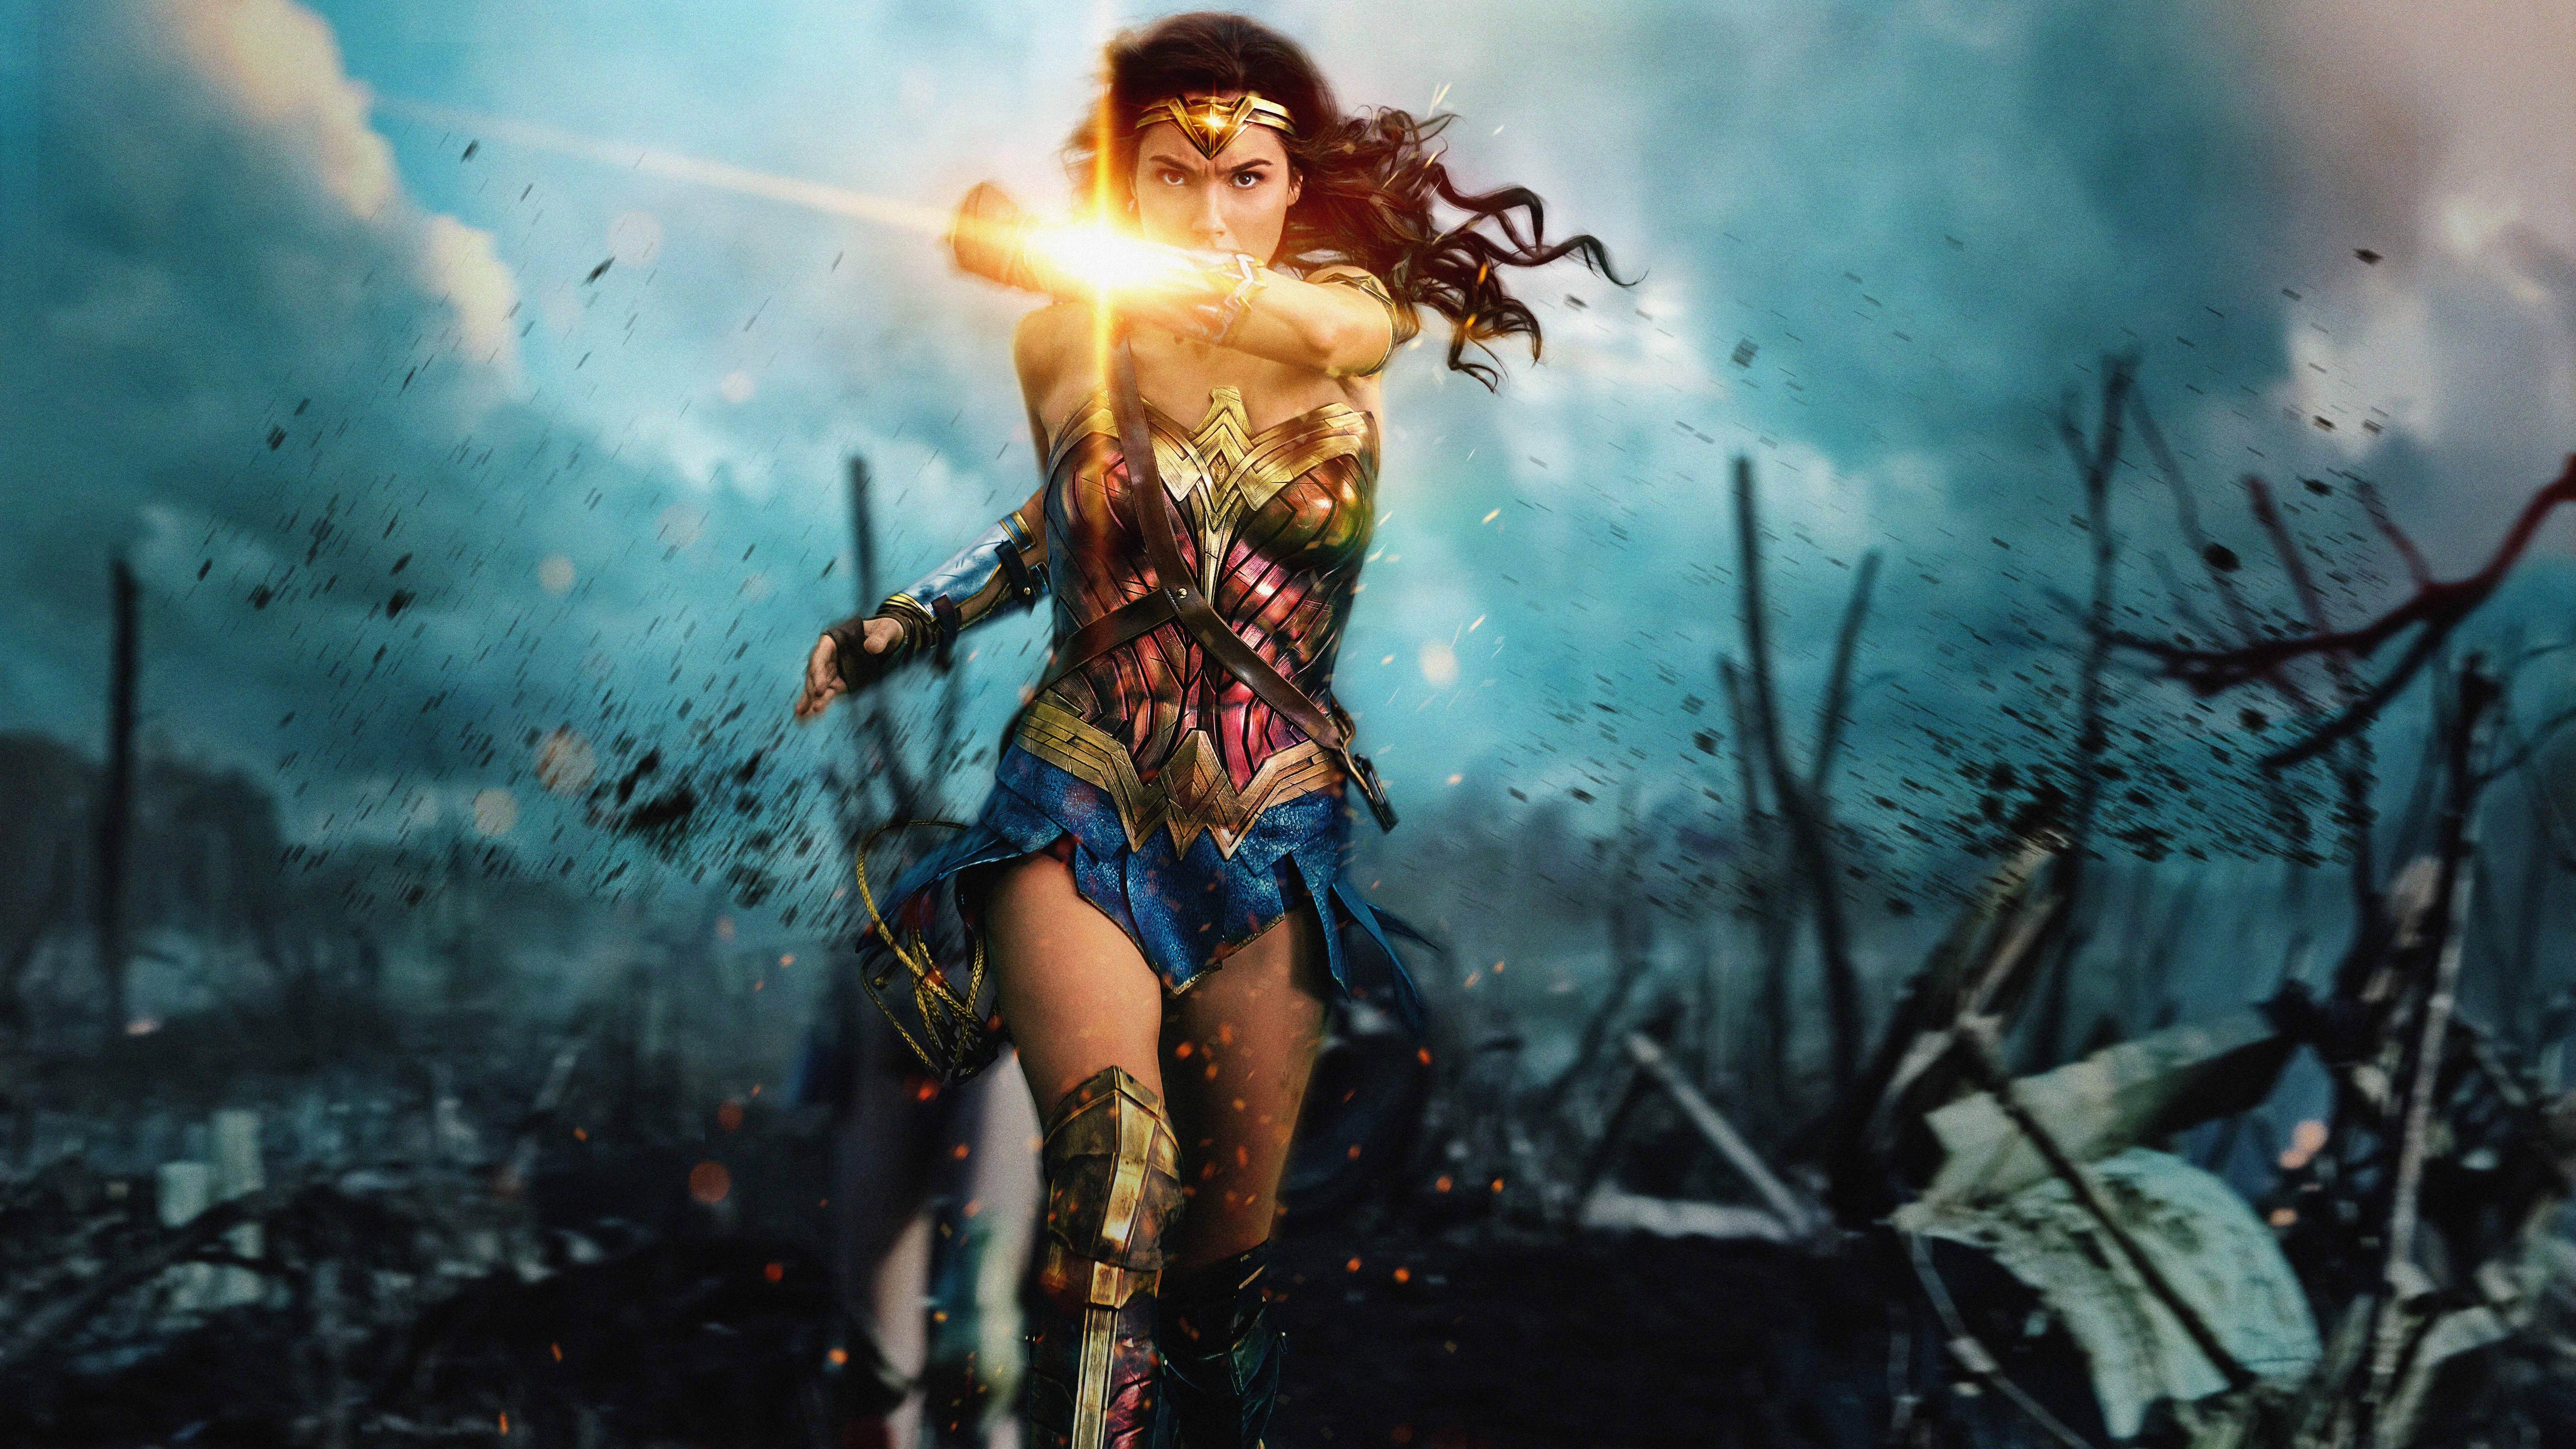 Wonder Woman 2017 Wallpaper Full Hd Free Download: 7680x4320 Wonder Woman 8k 2017 8k HD 4k Wallpapers, Images